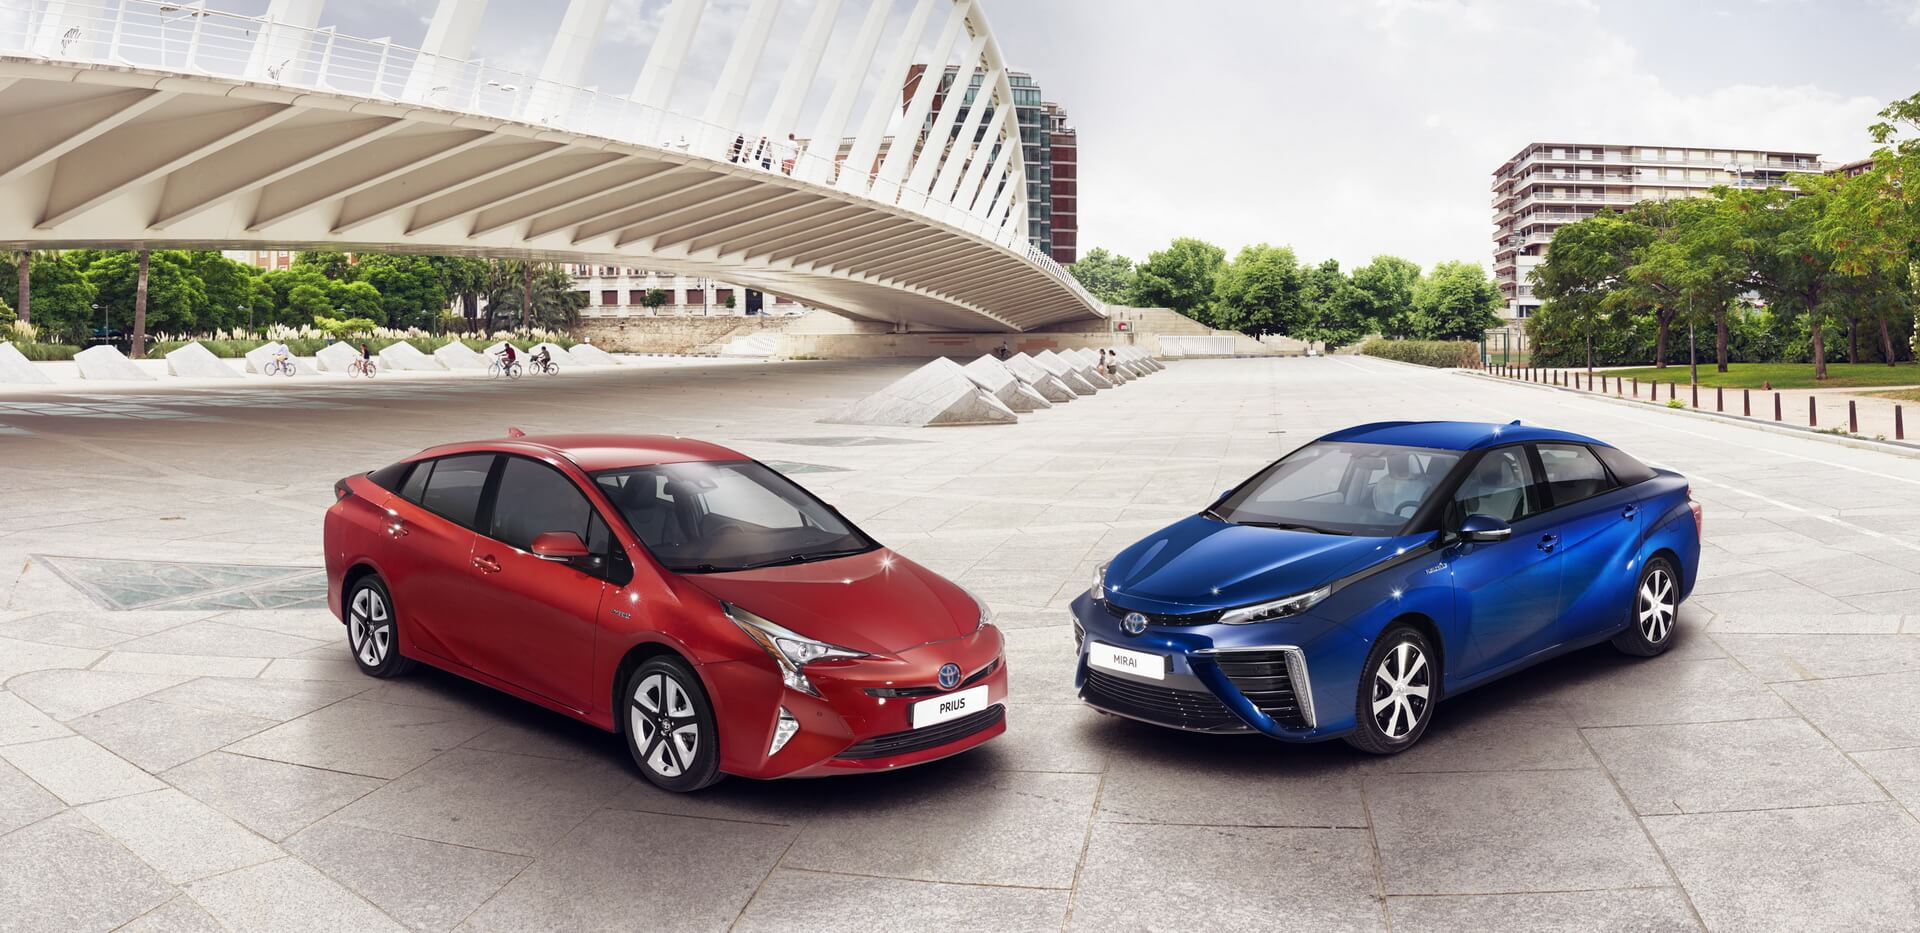 Гібрид Toyota Prius Hybrid та Toyota Mirai FCV на паливних елементах